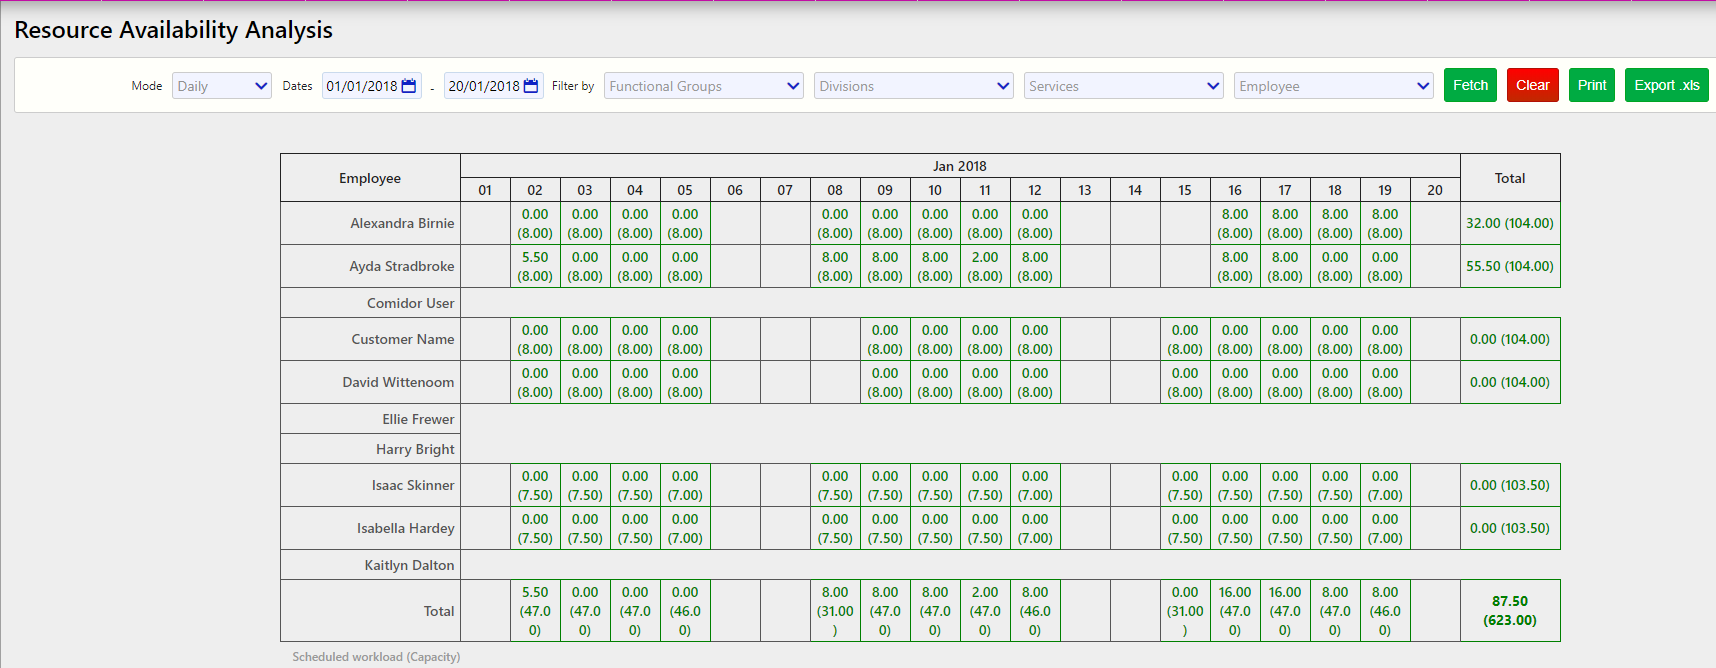 resource availability analysis / Comidor Digital Automation Platform